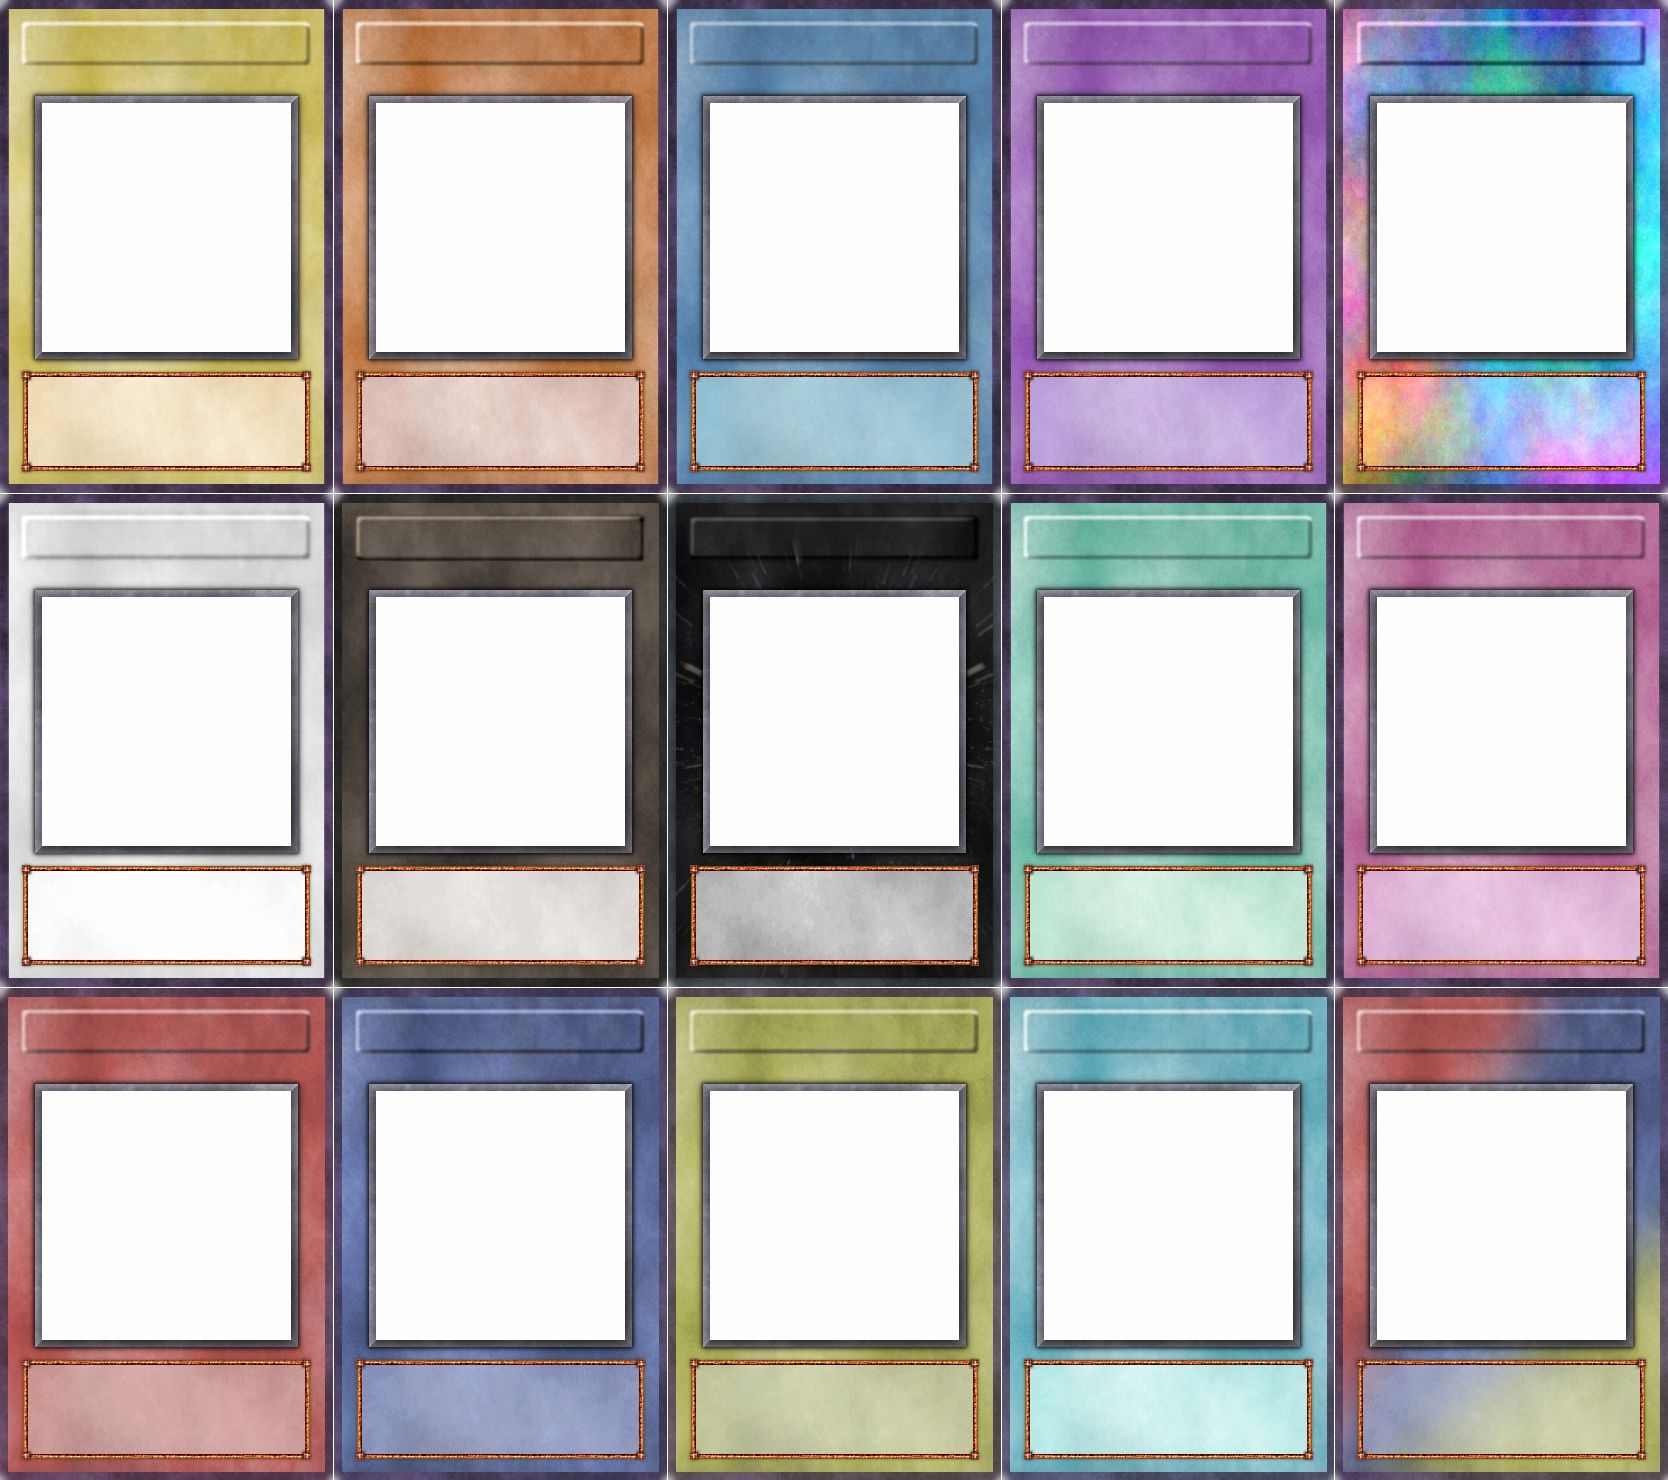 Printable Trading Card Template Beautiful Trading Card Template 21 Free Printable Word Pdf P Trading Card Template Card Templates Printable Card Templates Free